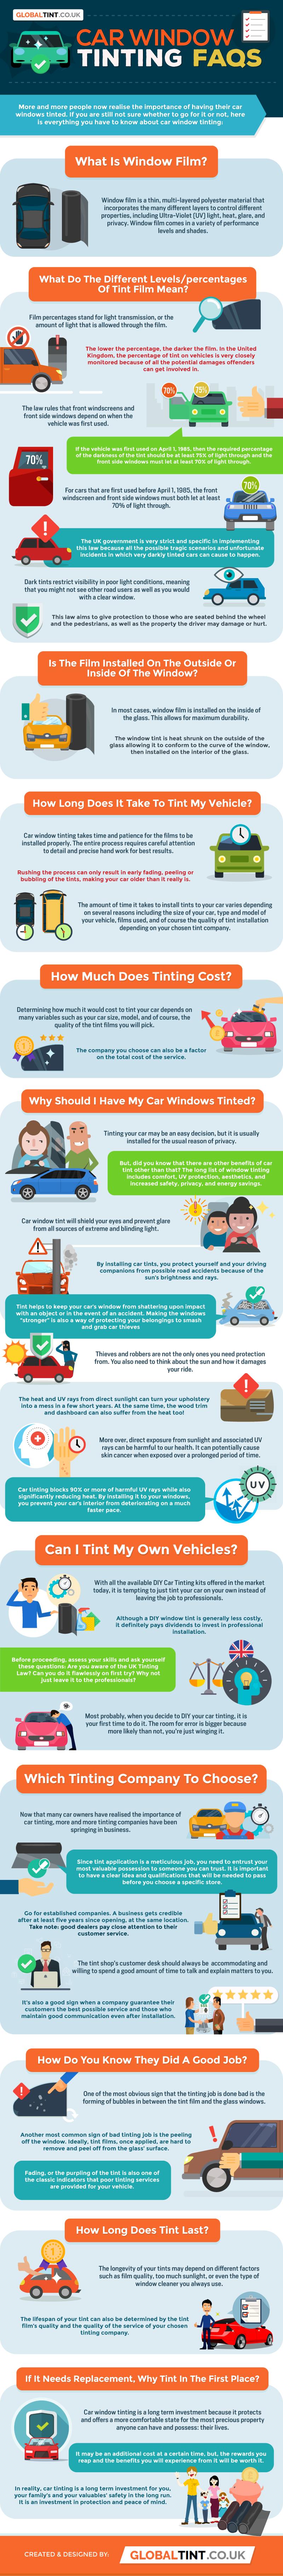 Car Window Tinting FAQs